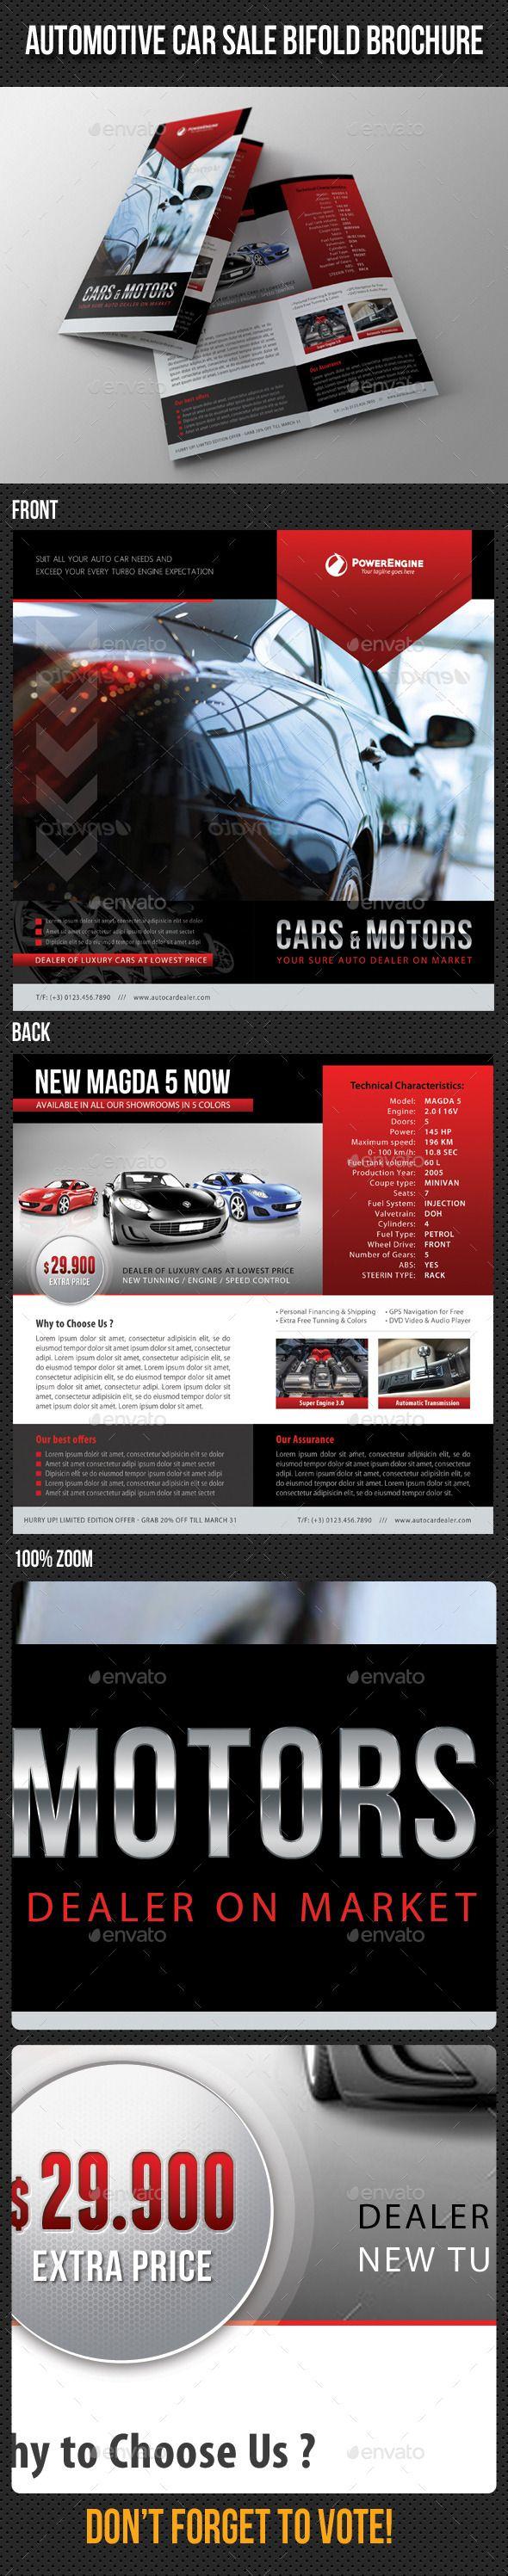 Best Automotive Brochure Template Images On